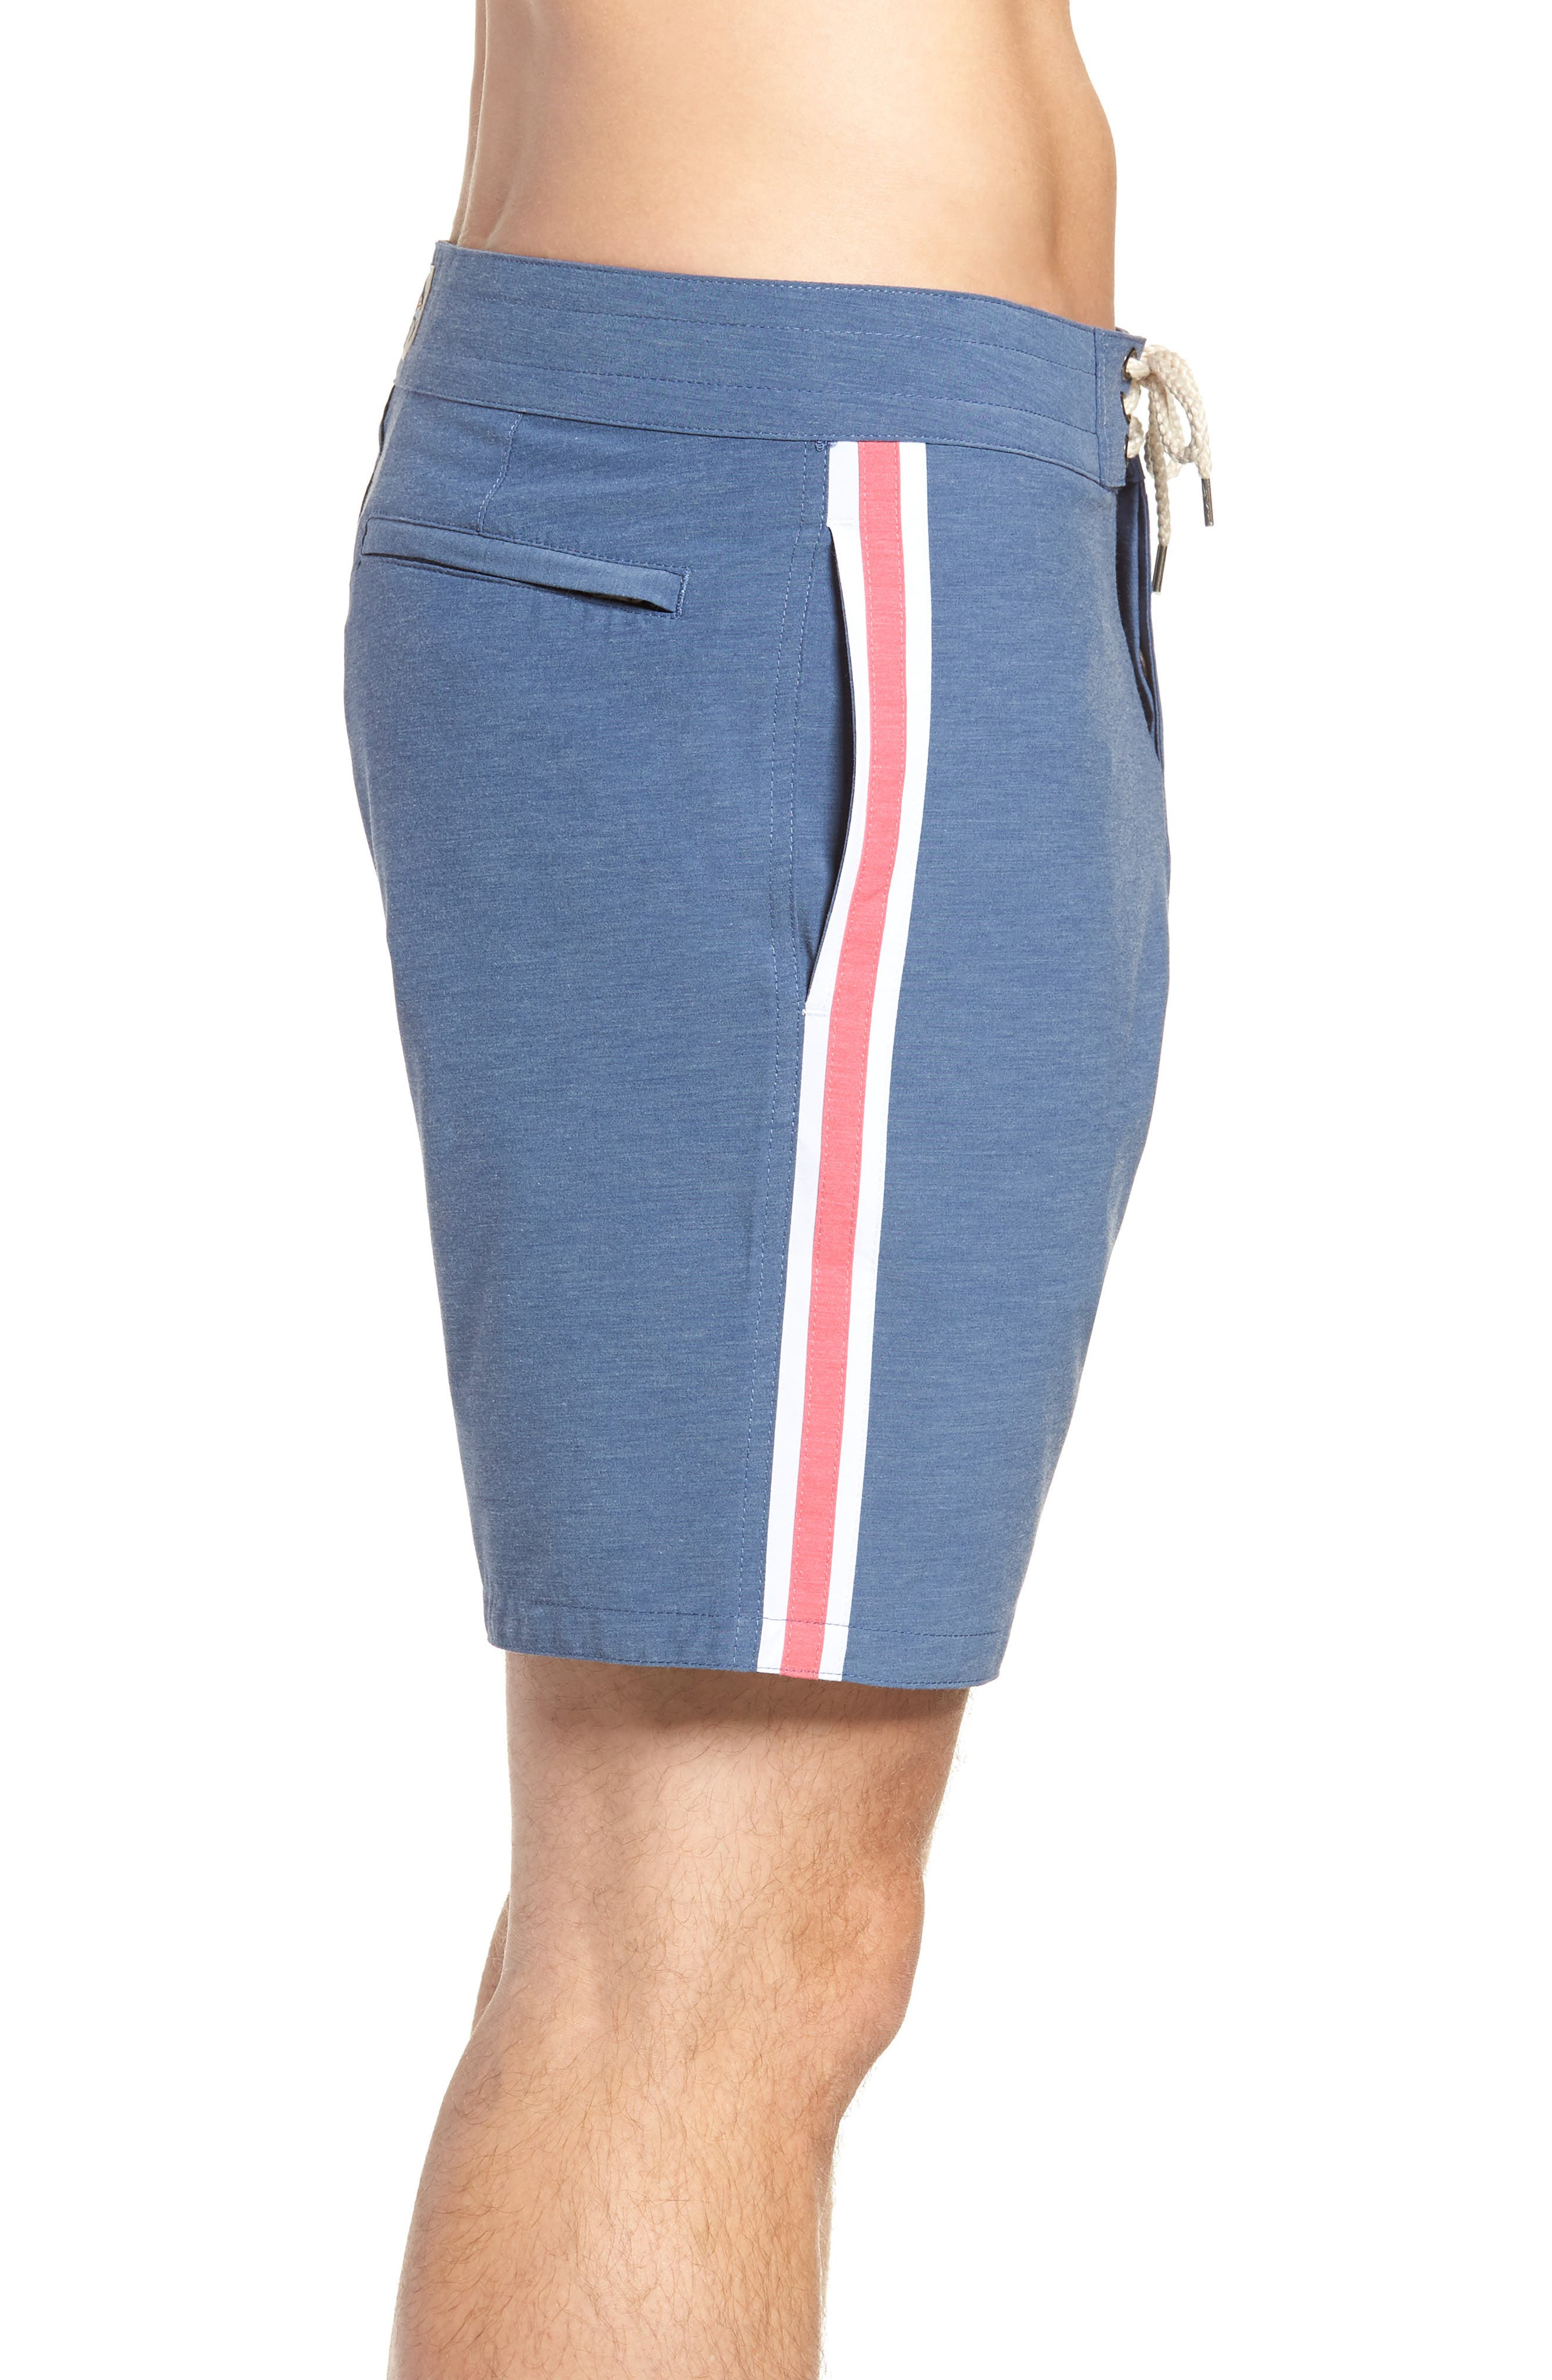 Retro Surf Stripe Board Shorts,                             Alternate thumbnail 5, color,                             Blue Red White